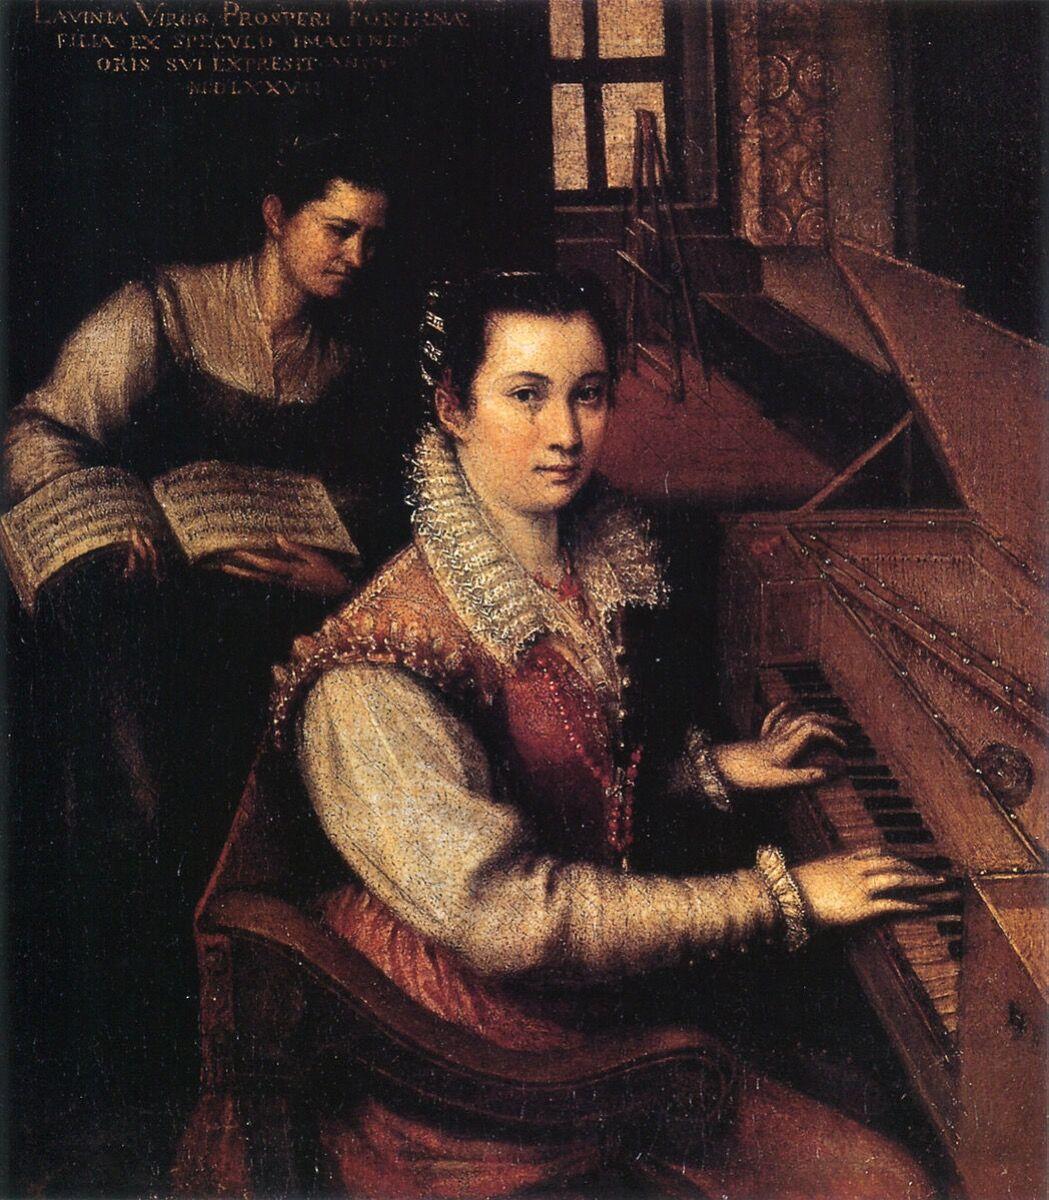 Lavinia Fontana, Self-portrait at the Virginal with a Servant, 1577.